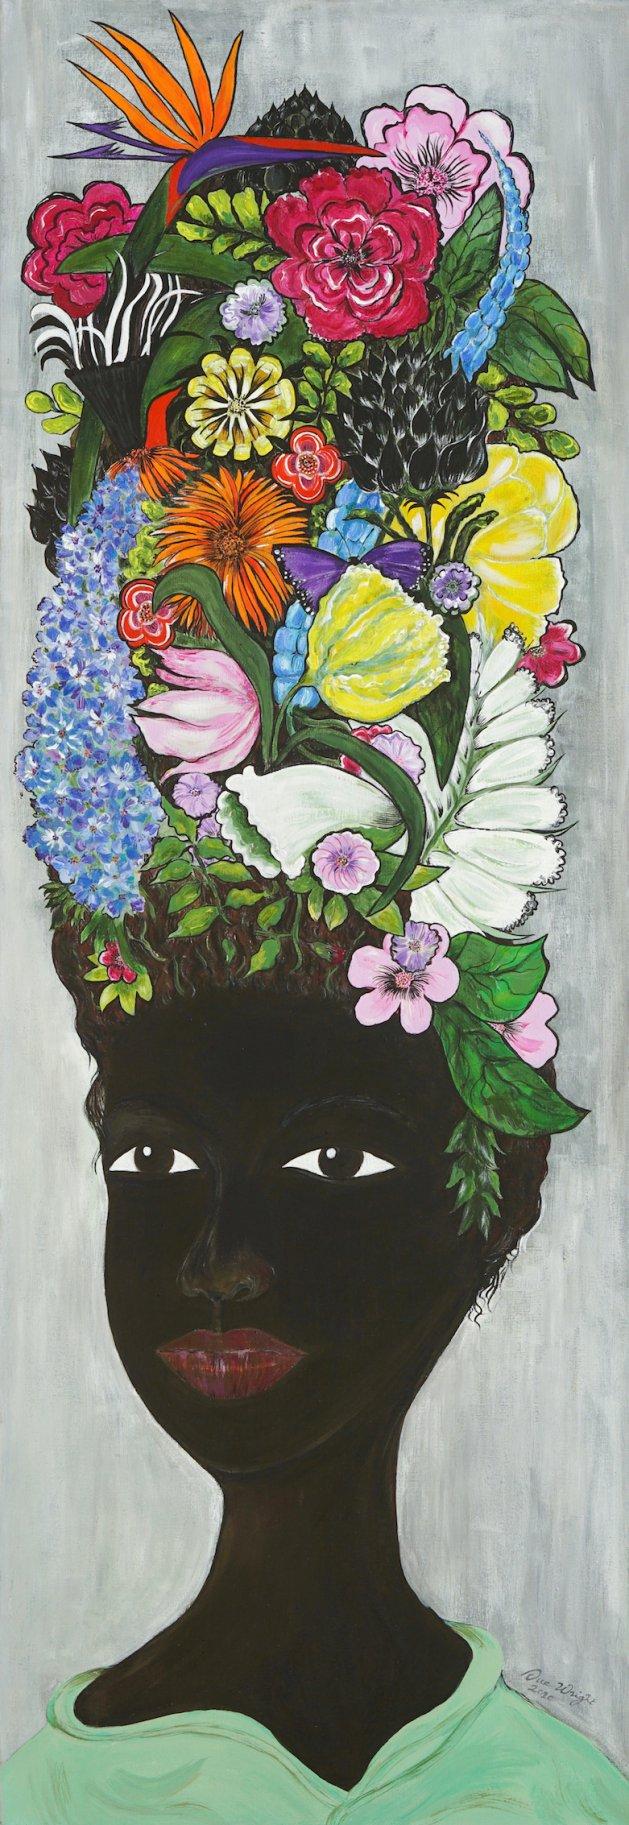 FlowerHead. Original art by Sue Wright